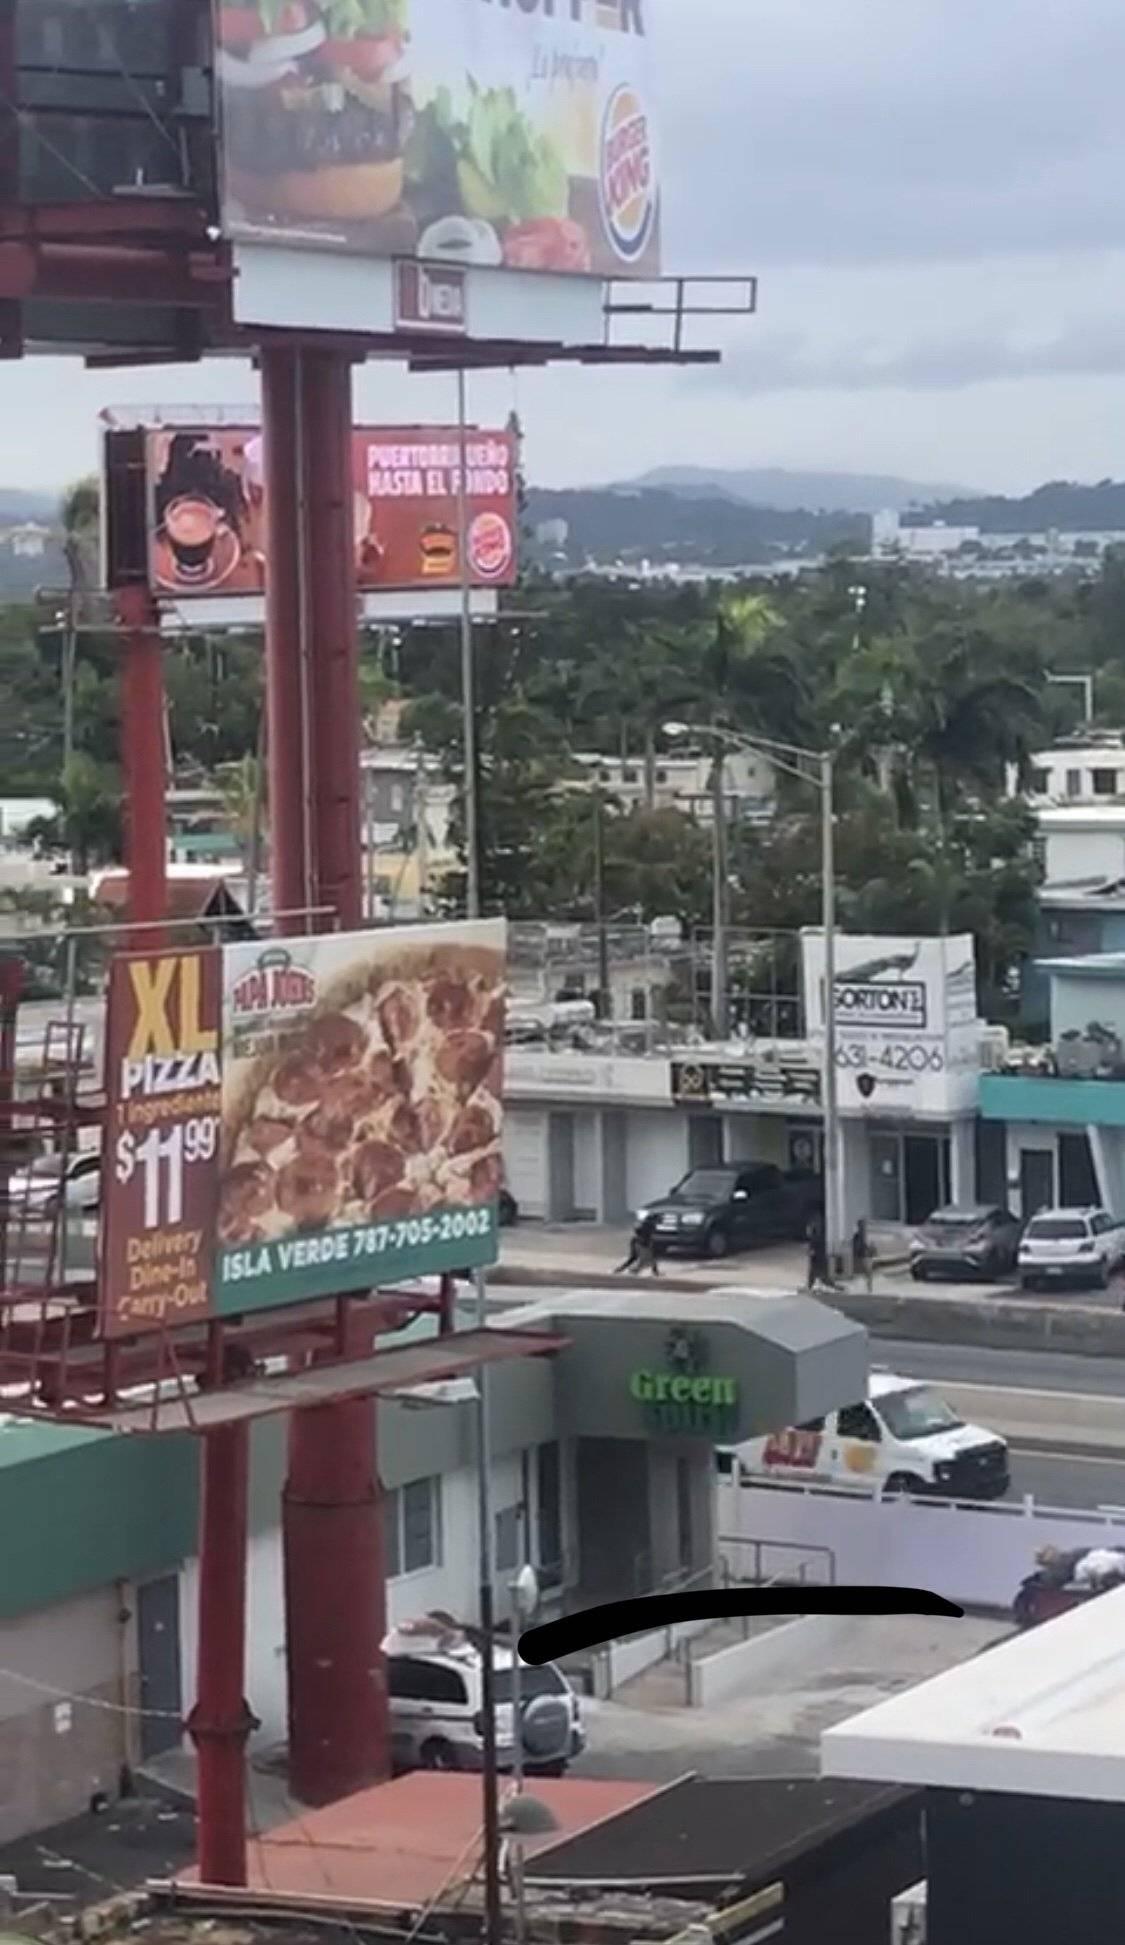 islaverde